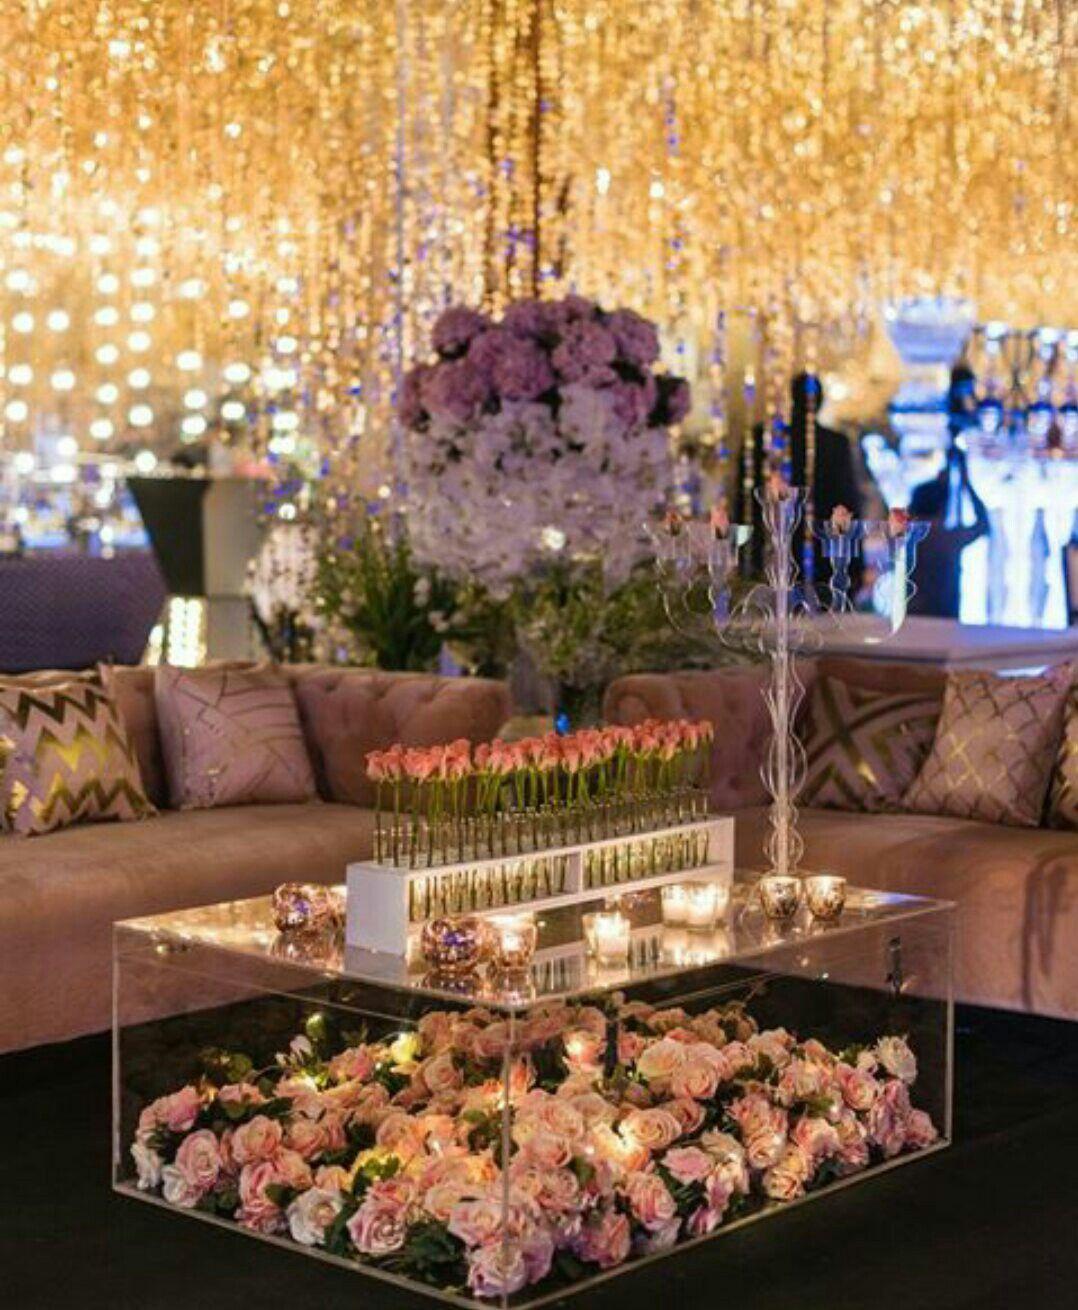 Cute Wedding Ideas For Reception: Wedding Decorations, Brides Room